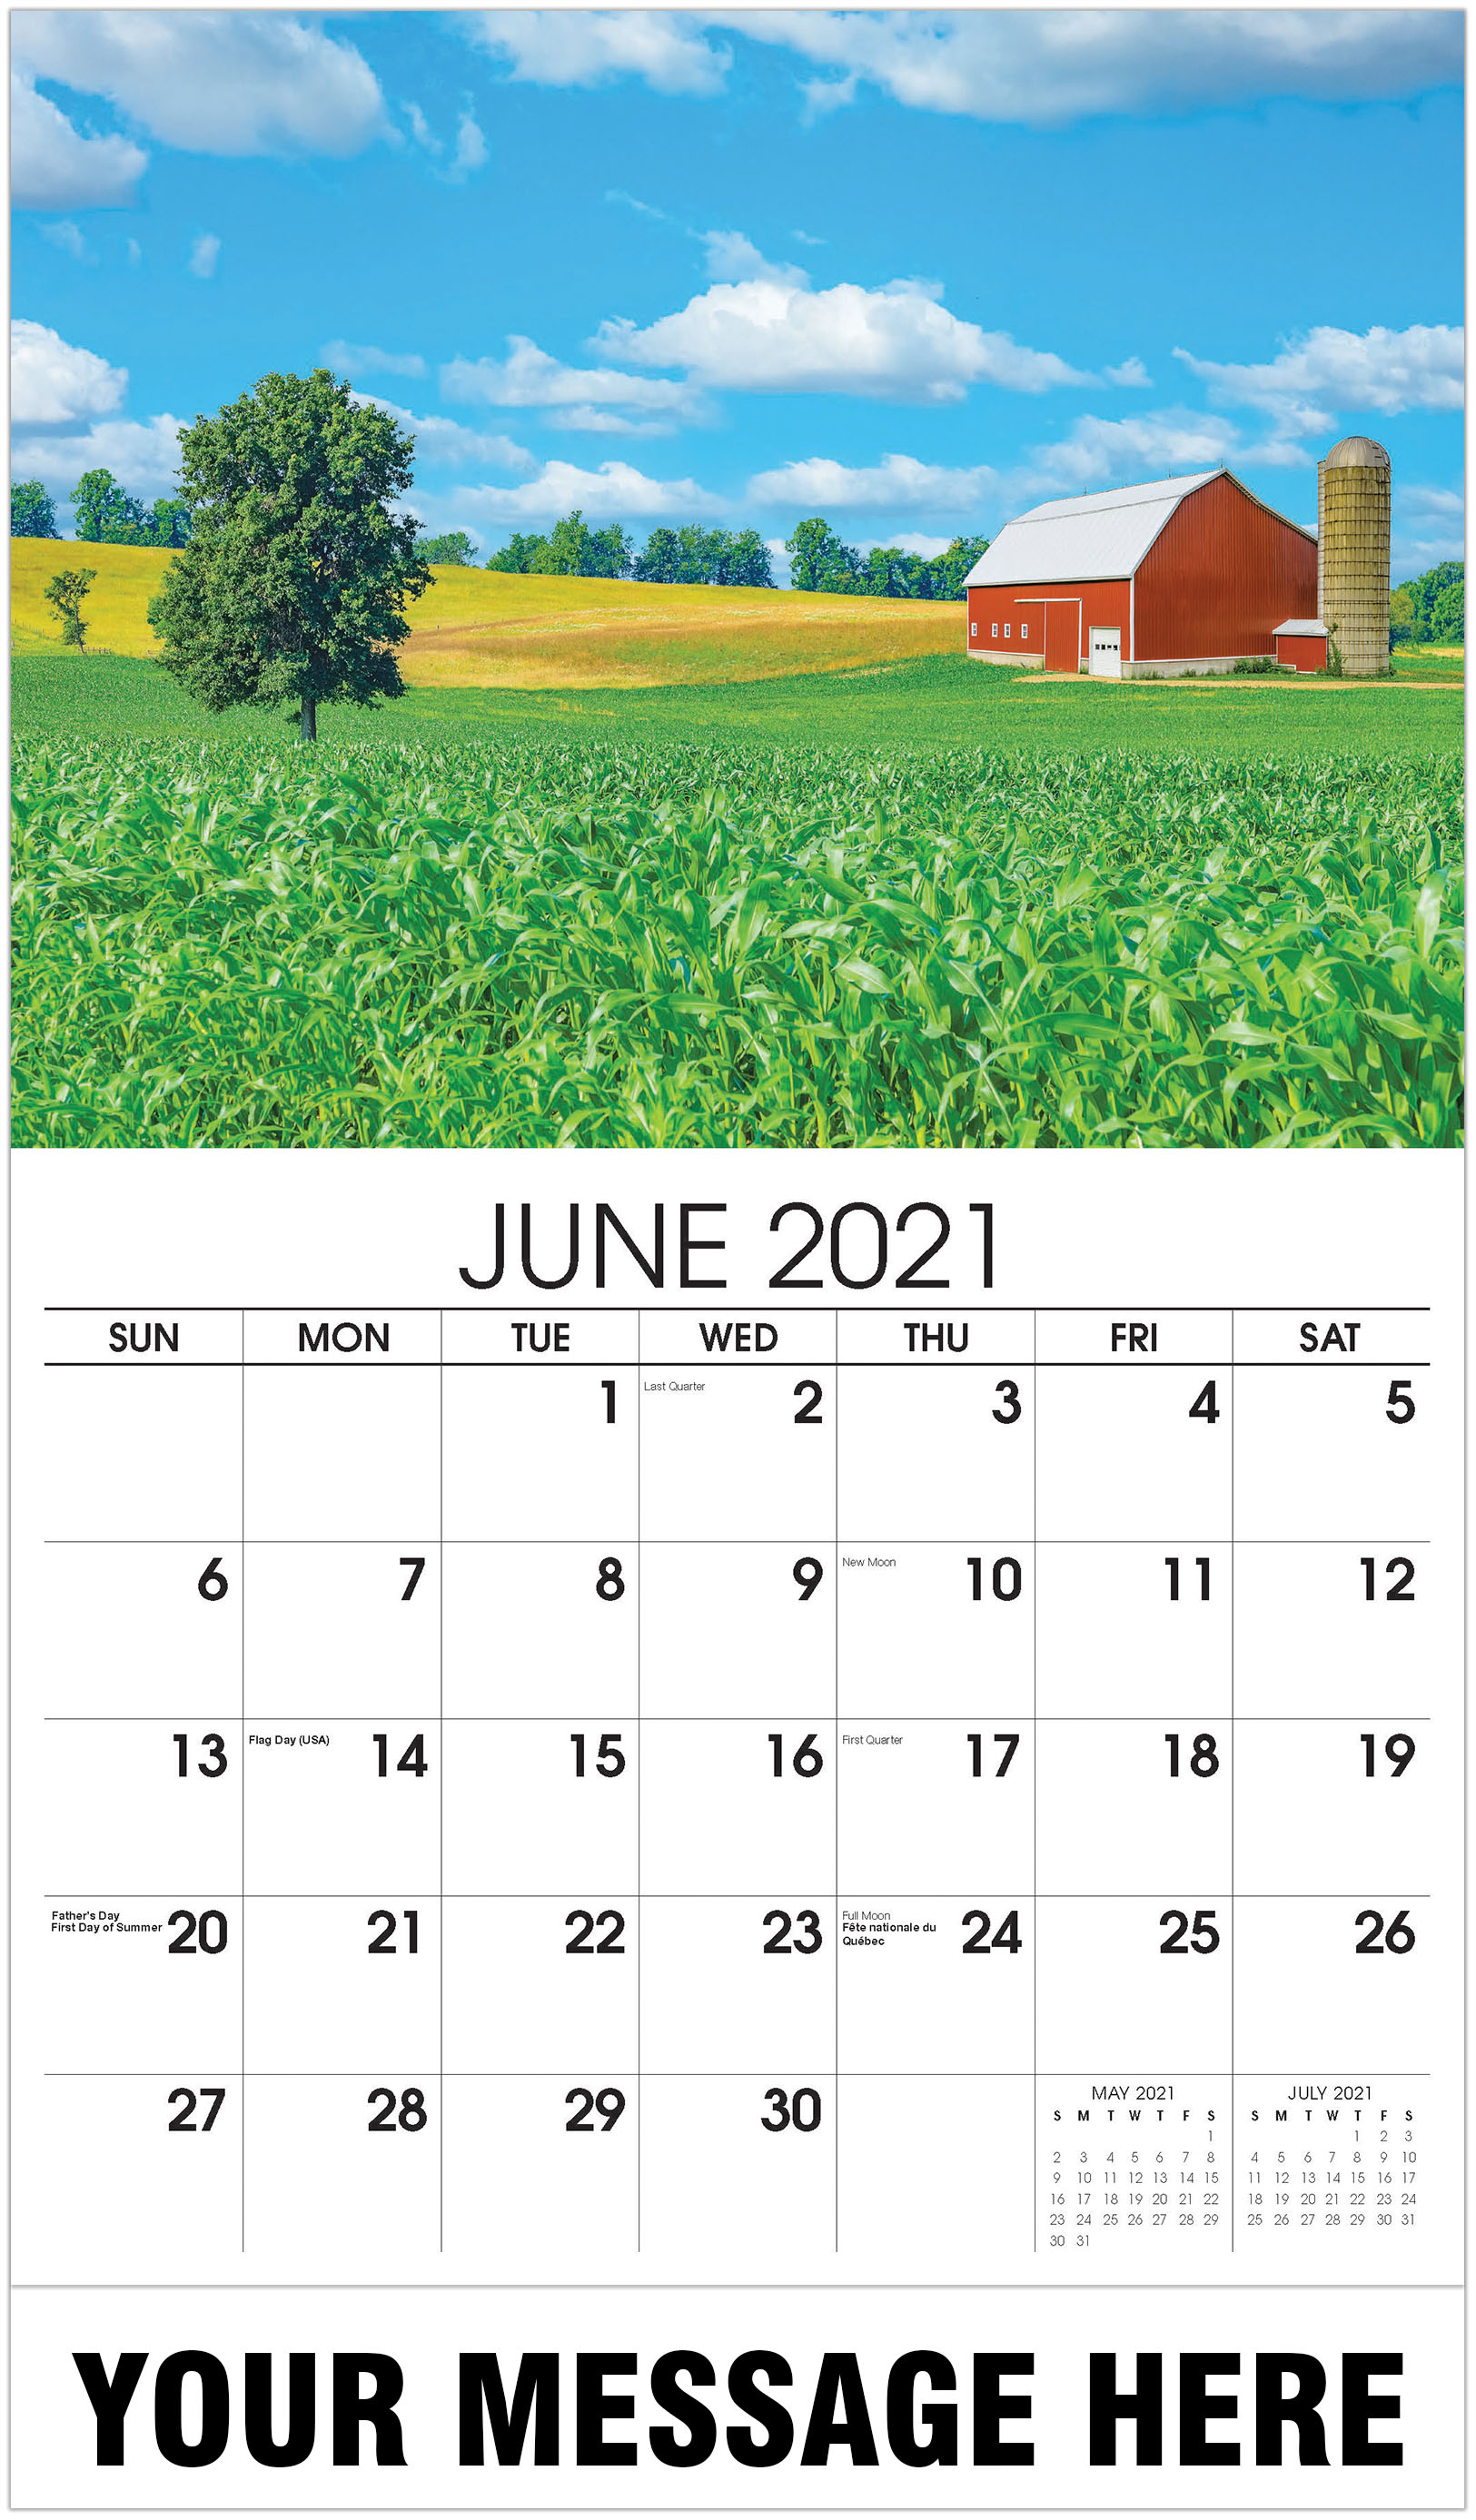 Farmhouse - June - Country Spirit 2021 Promotional Calendar